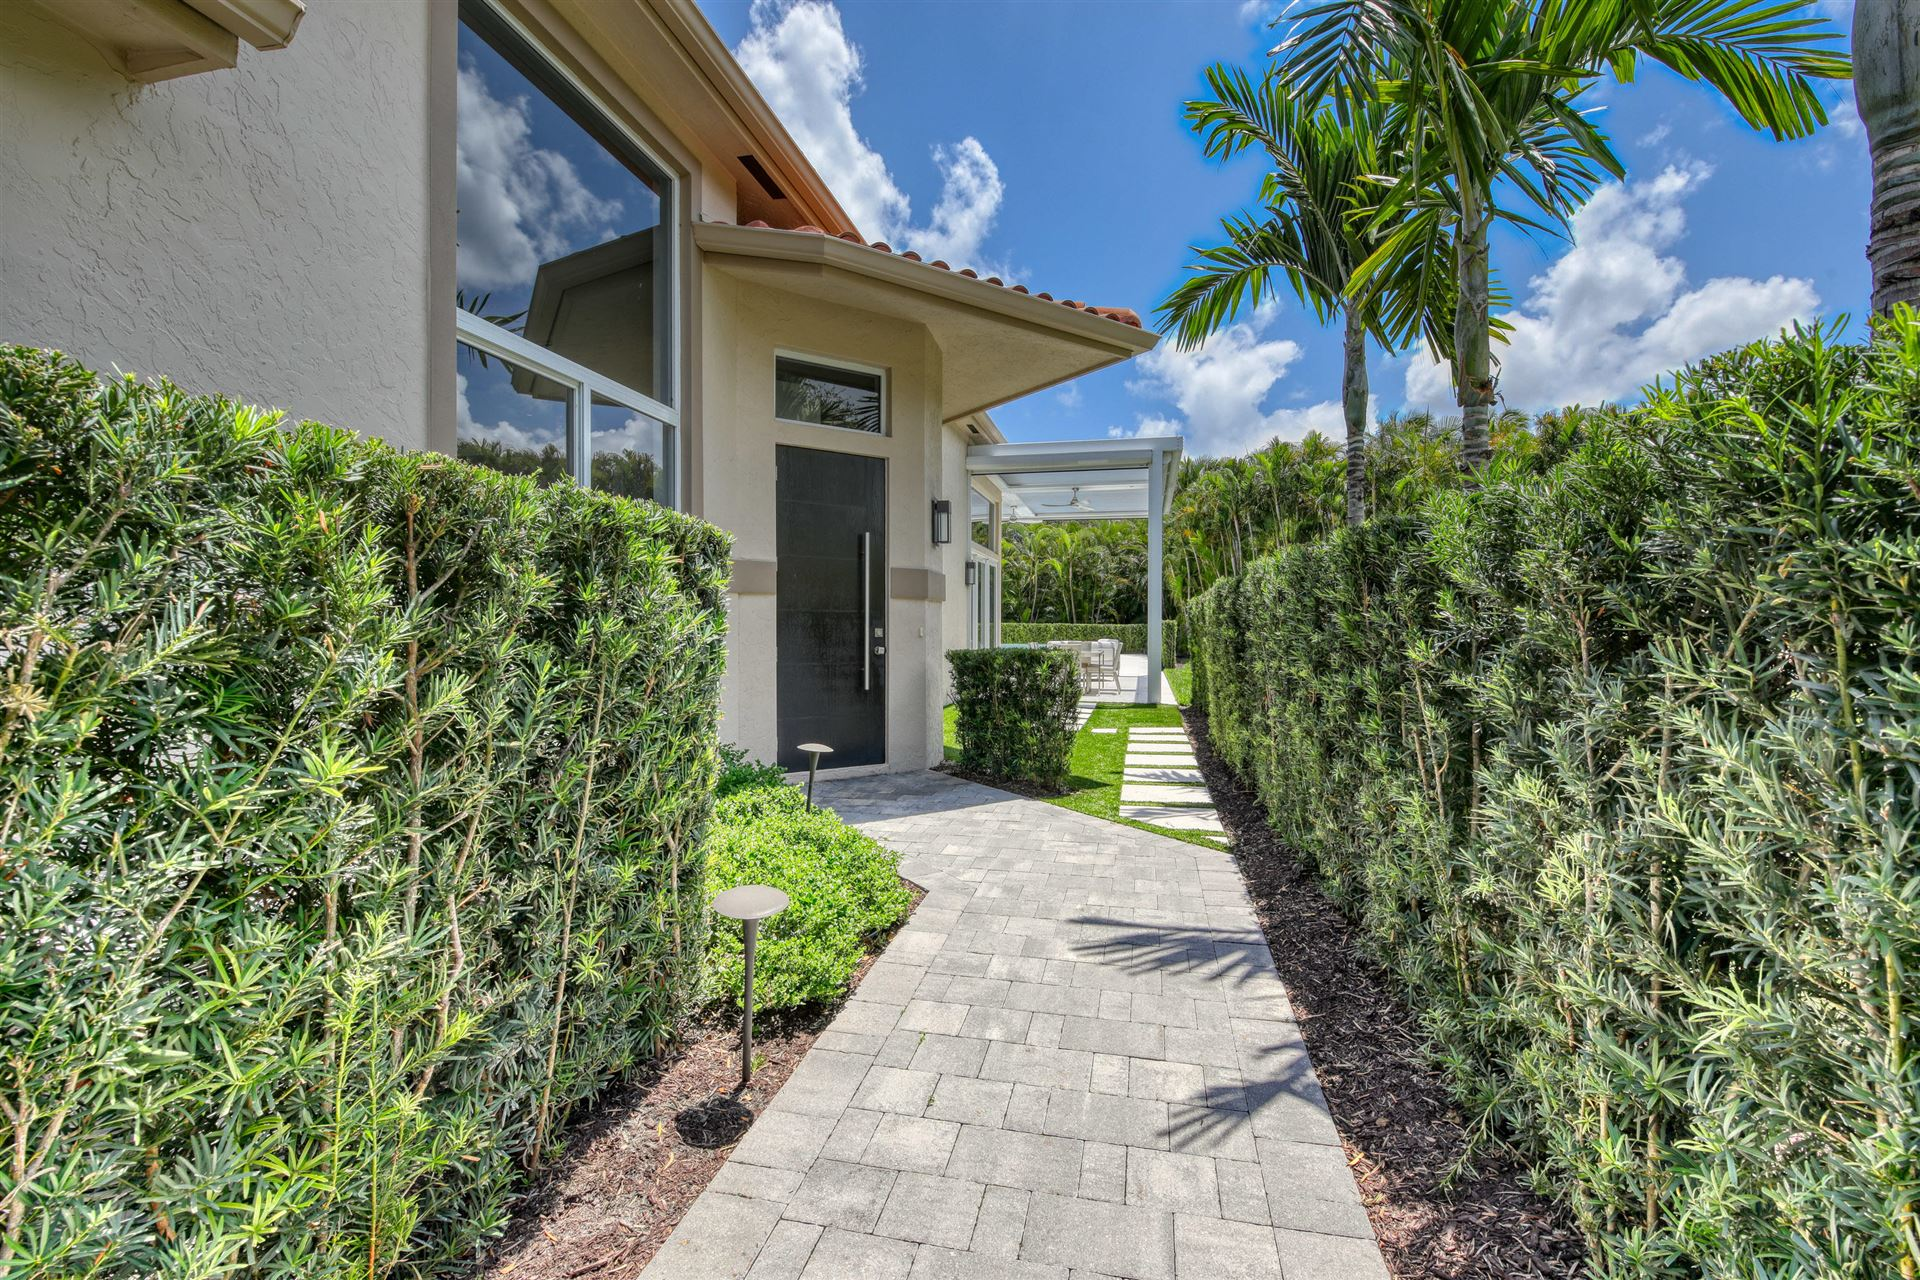 Photo of 13870 Parc Drive, Palm Beach Gardens, FL 33410 (MLS # RX-10712263)